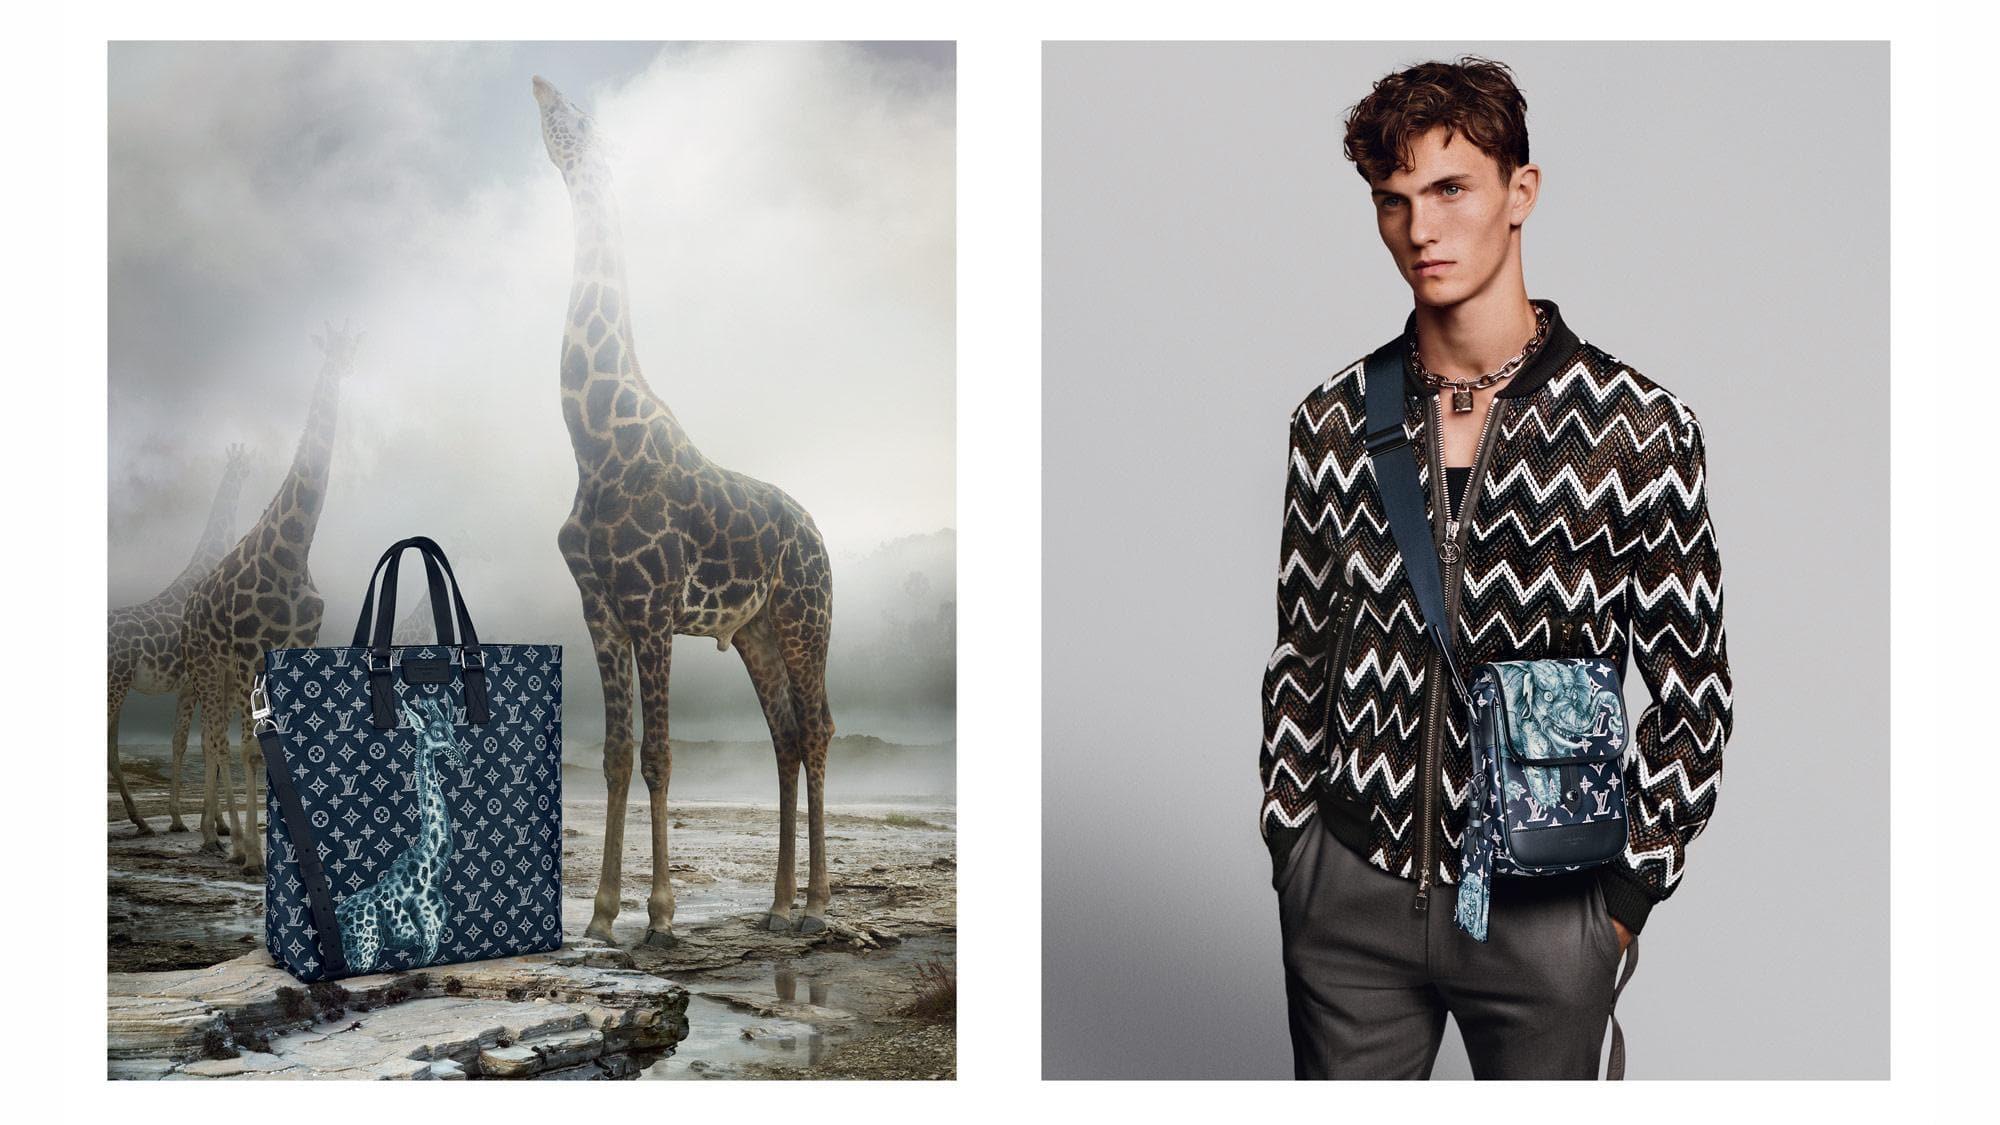 louis-vuitton--Louis_Vuitton_817_New_MensCampaign_1_DI3.jpg